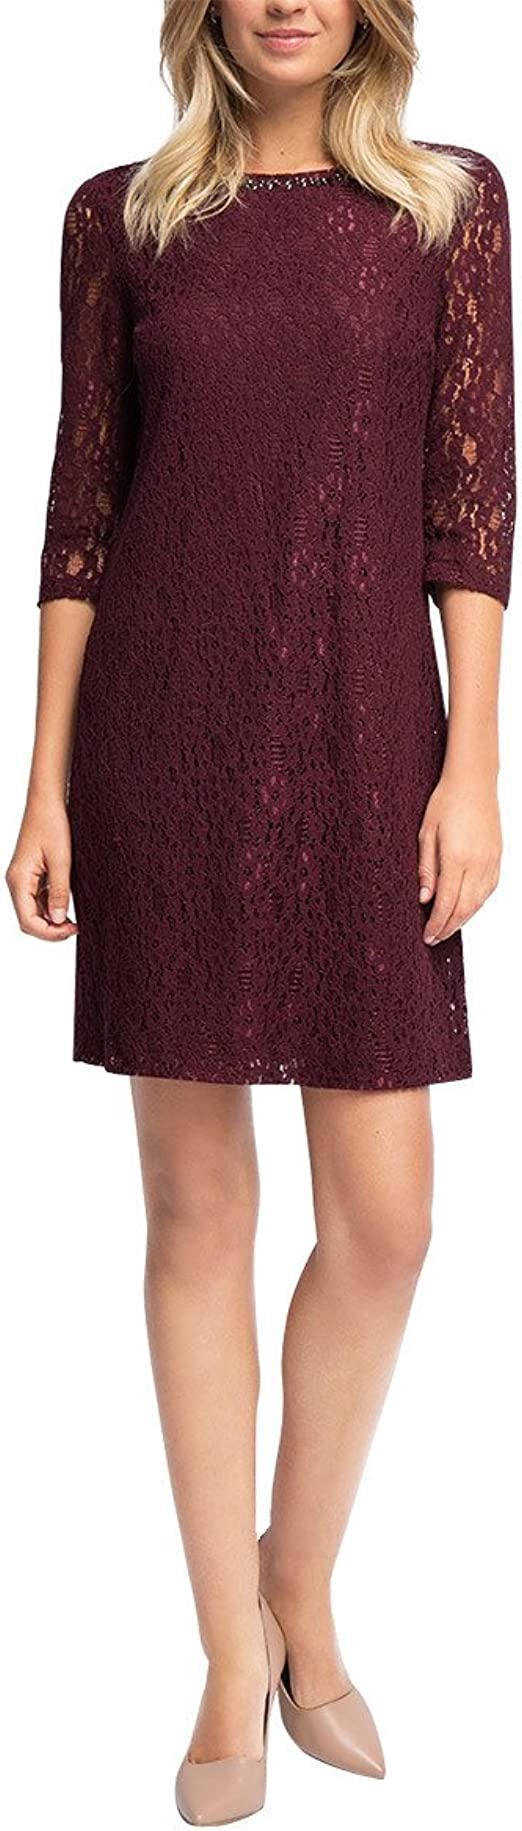 ESPRIT Collection Damen Kleid aus Spitze, Knielang, Gr. 15, Rot